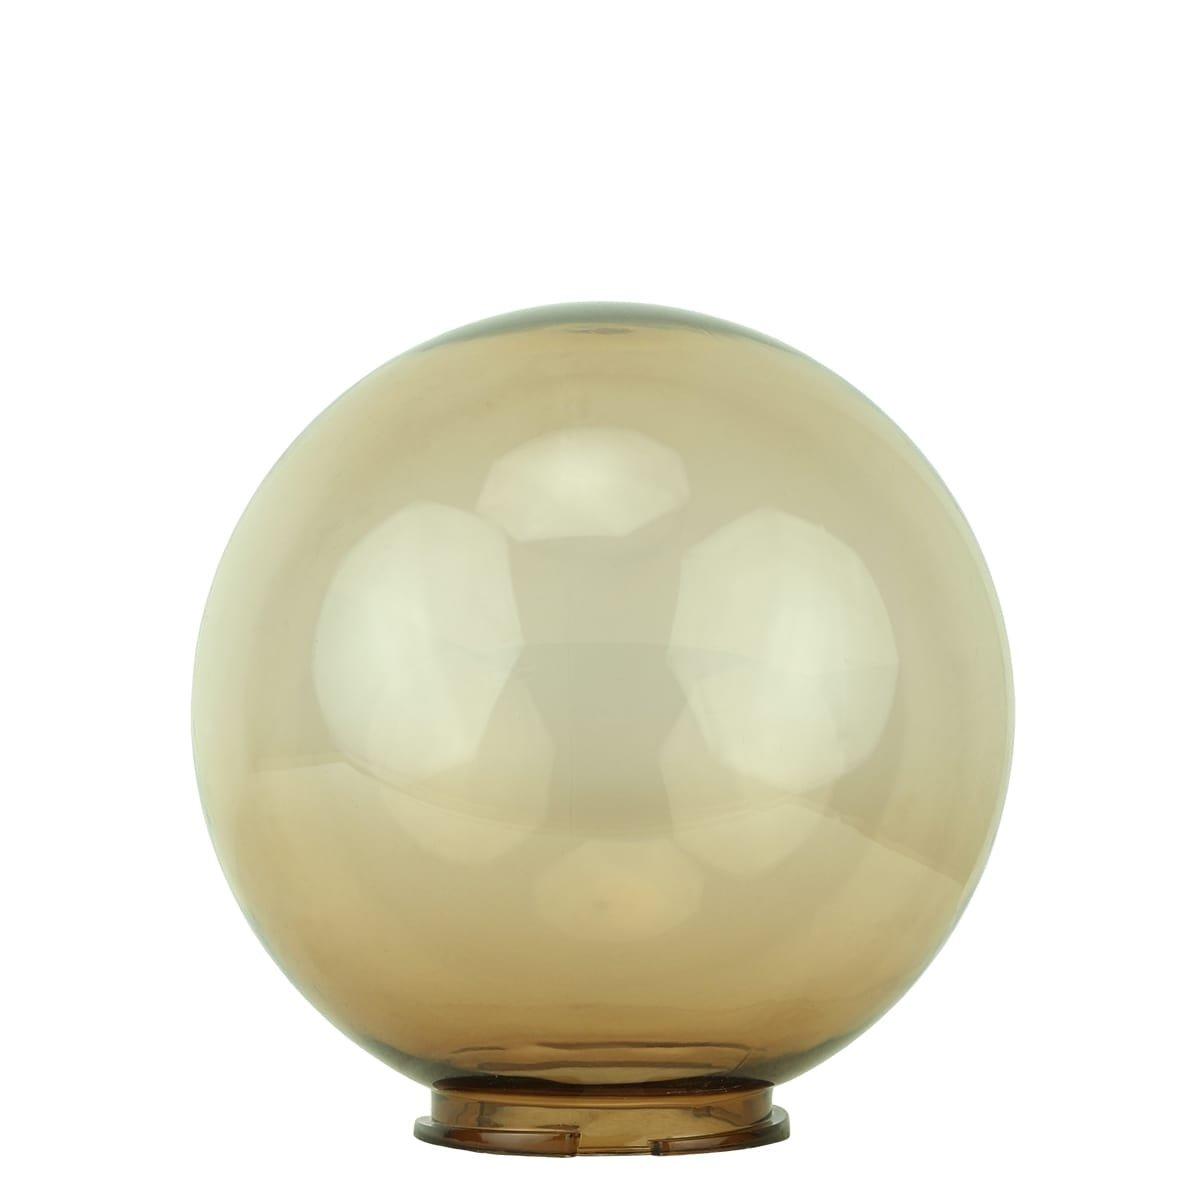 Buitenverlichting Onderdelen Losse bol kunststof rookglas - Ø 20 cm